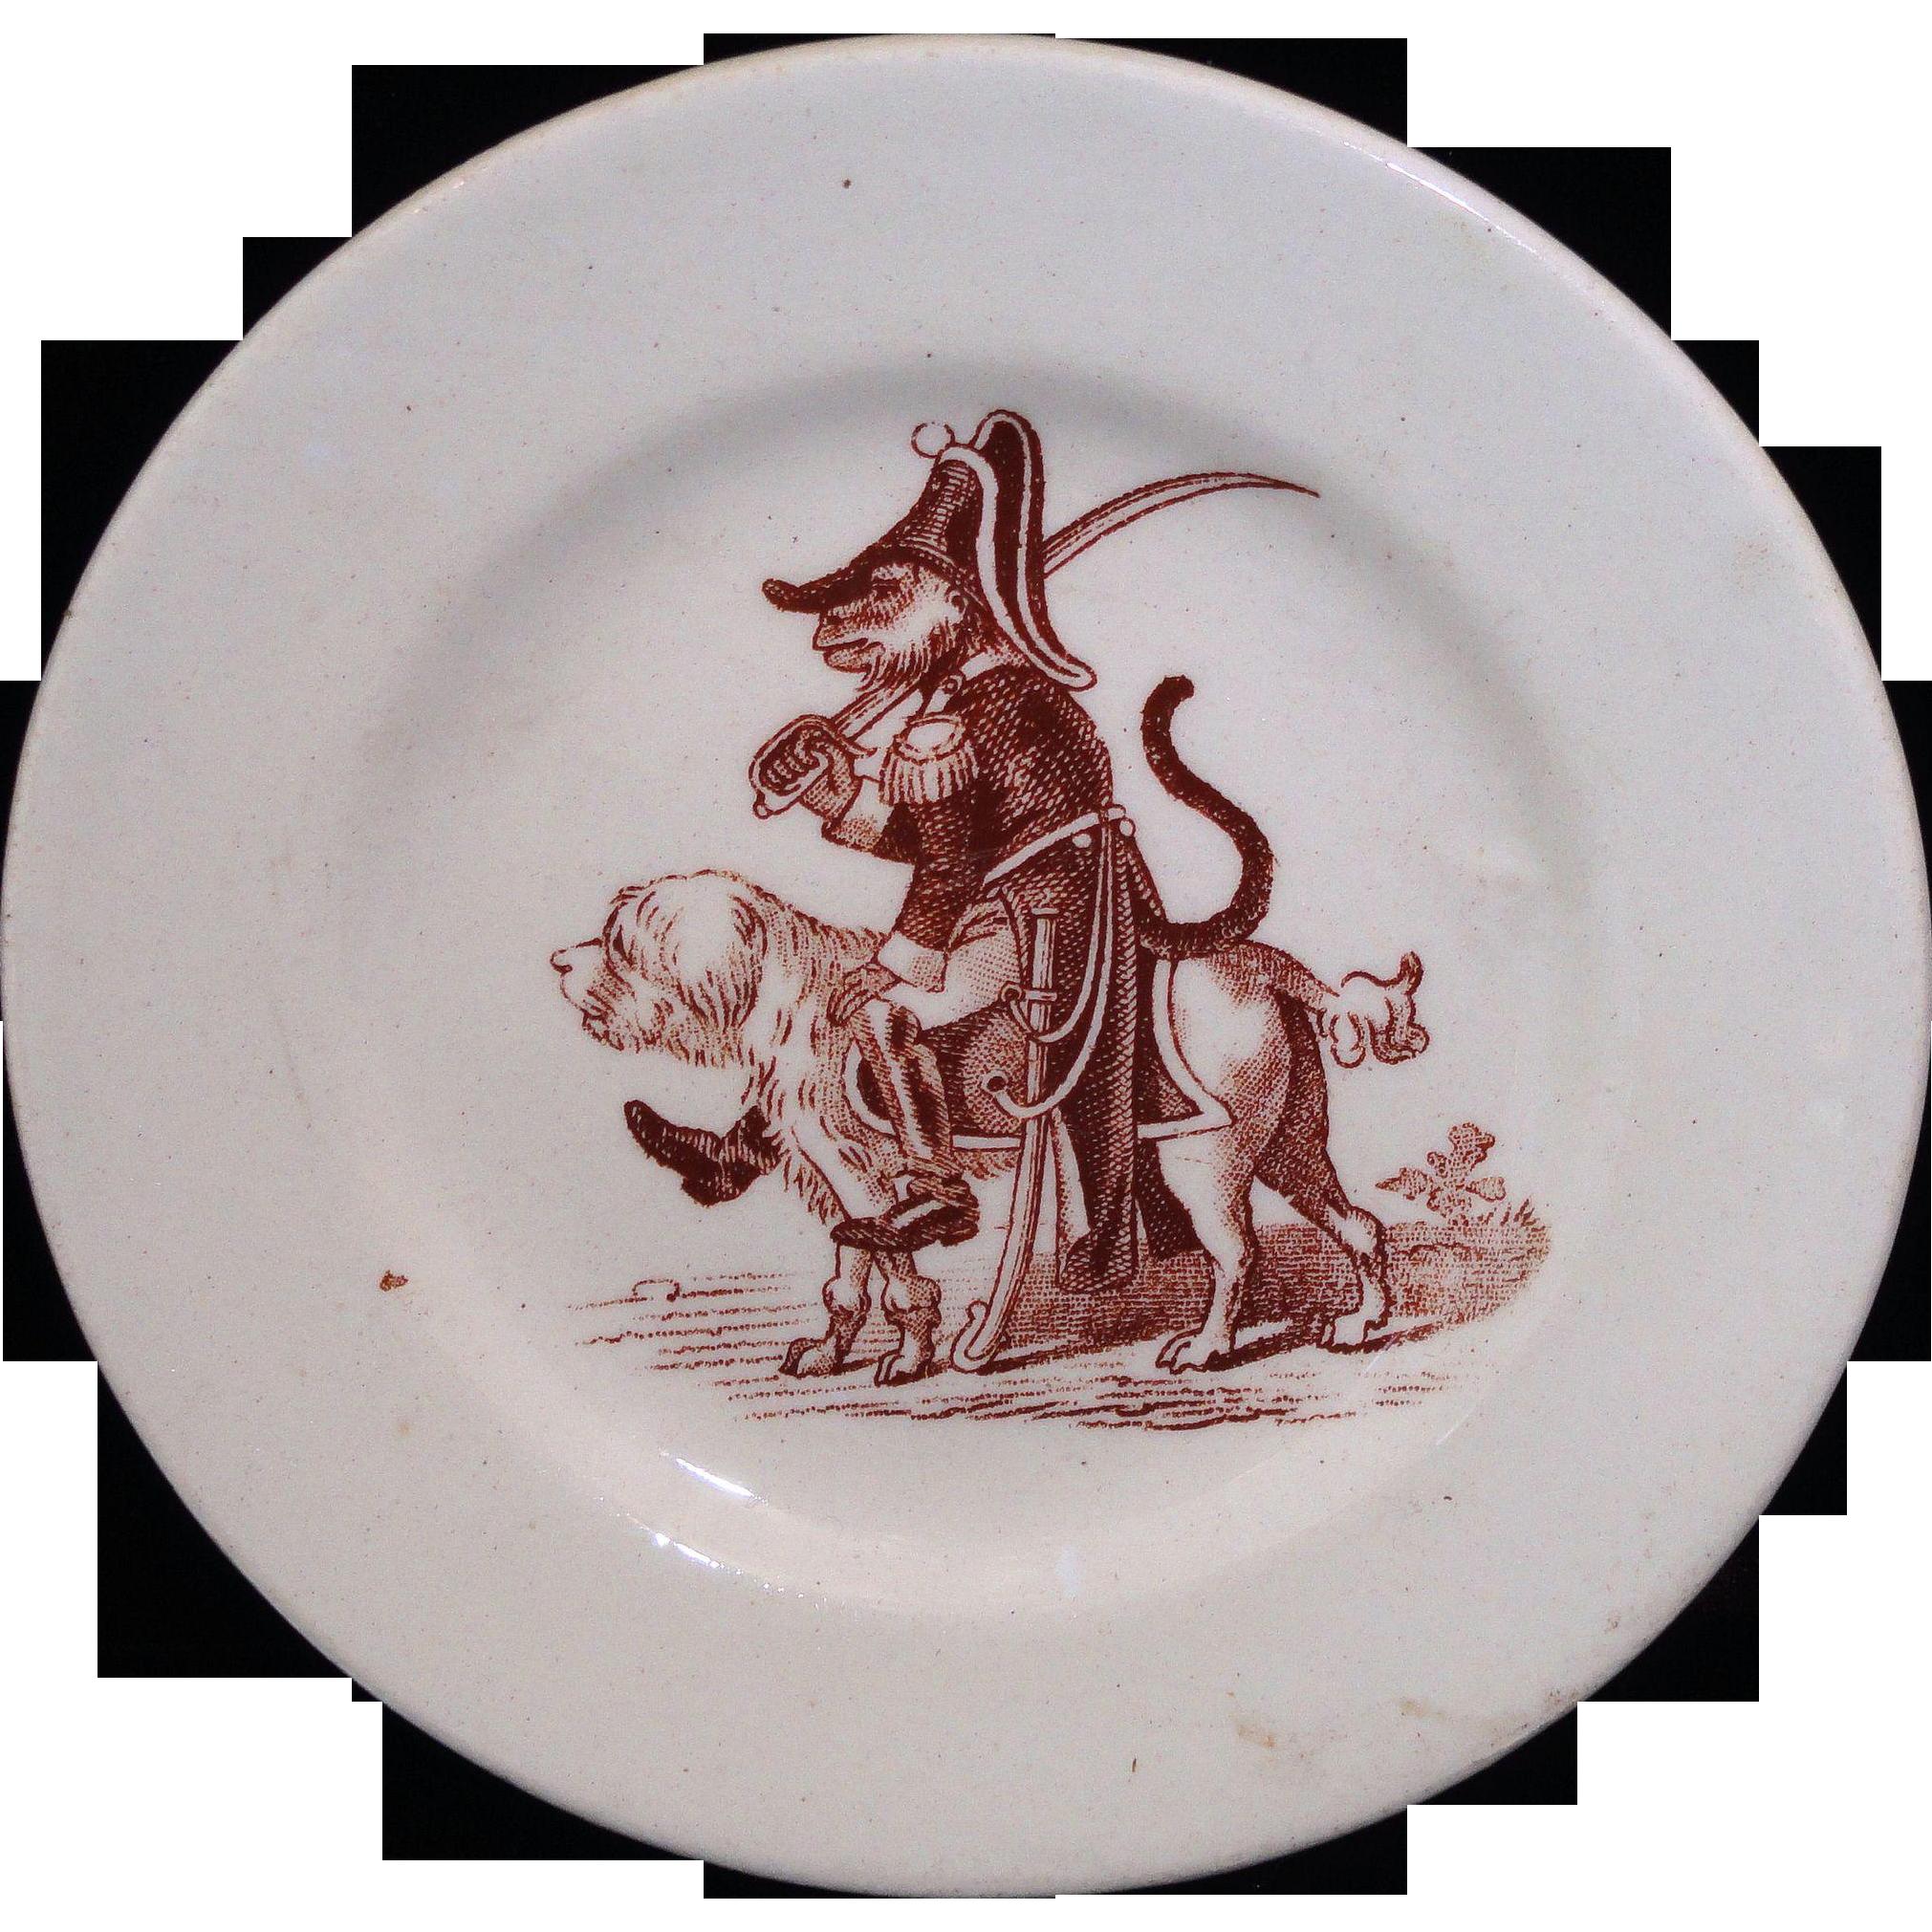 NAPOLEON Monkey WELLINGTON Dog French Toy Historical Caricature Plate  Keller & Guerin Luneville France 1870